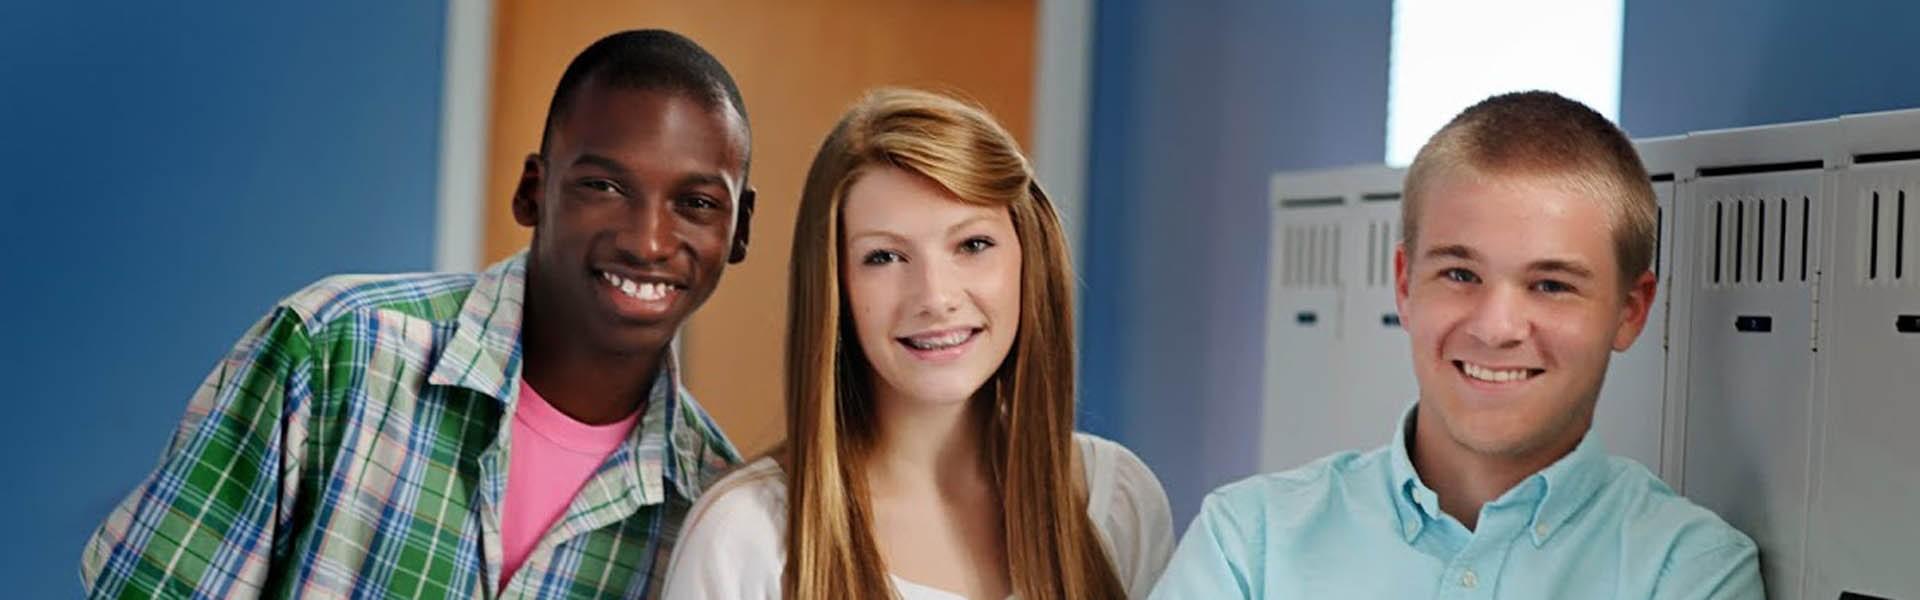 Bishop Rosecrans Ohio Students Banner 2019